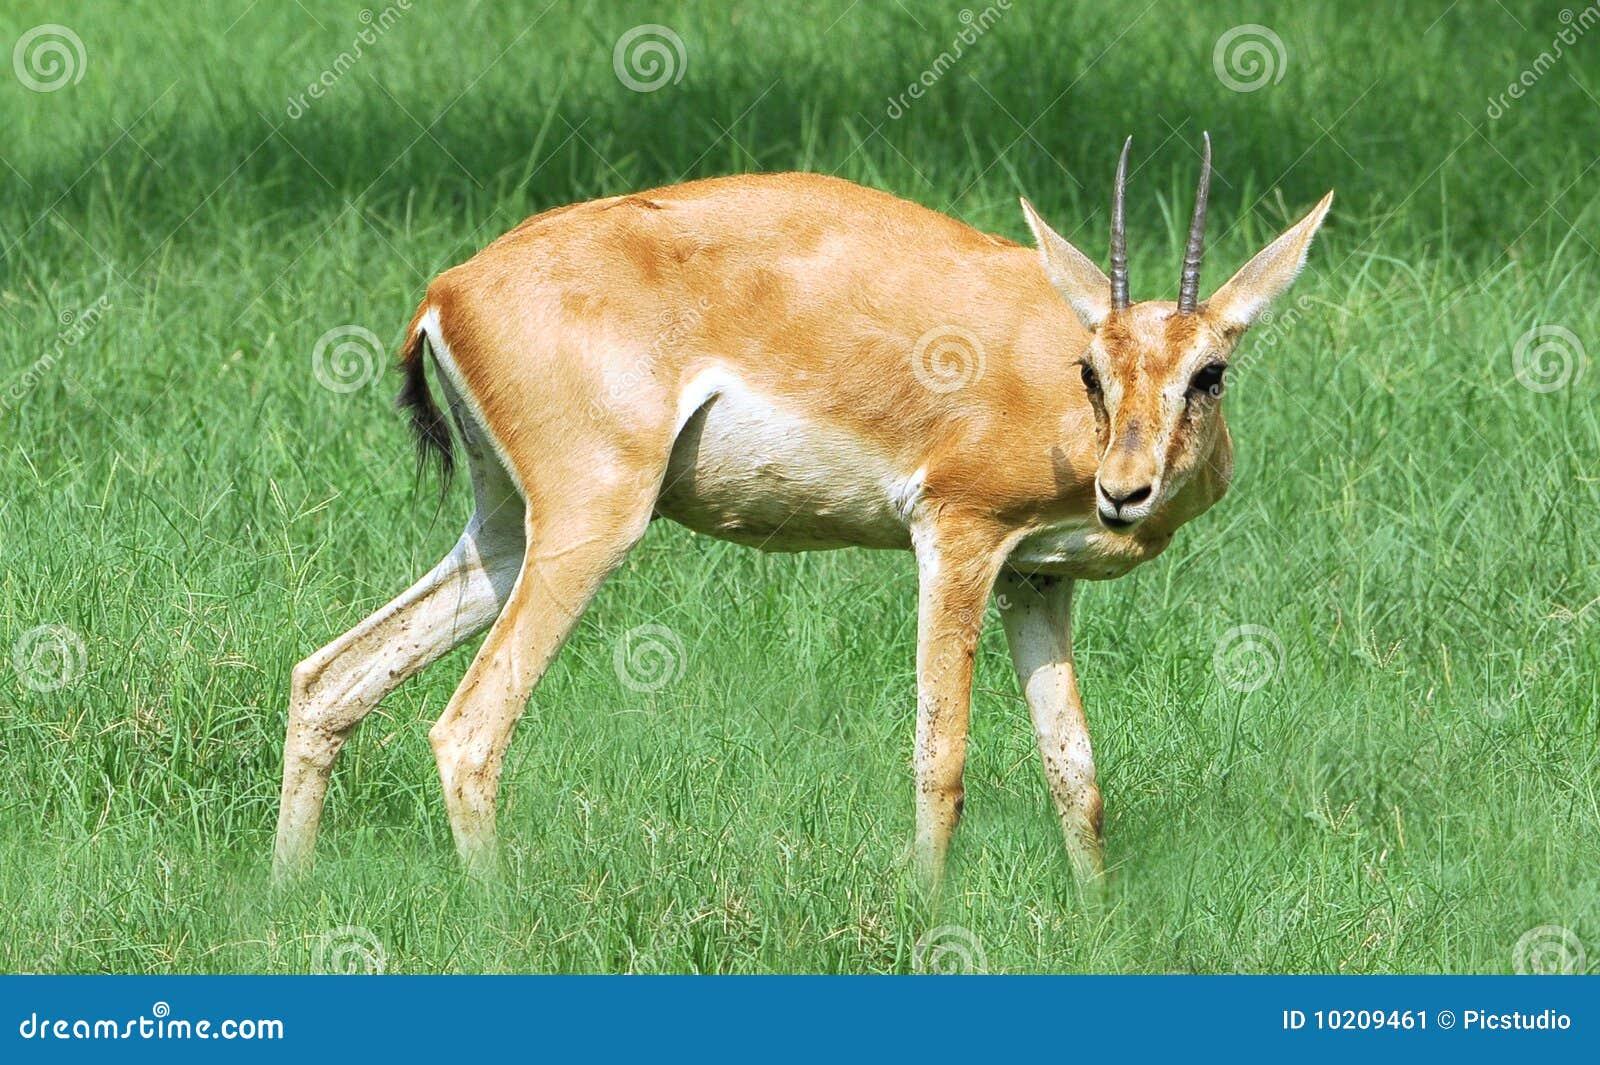 Alert chinkara deer stock image  Image of wildlife, grass